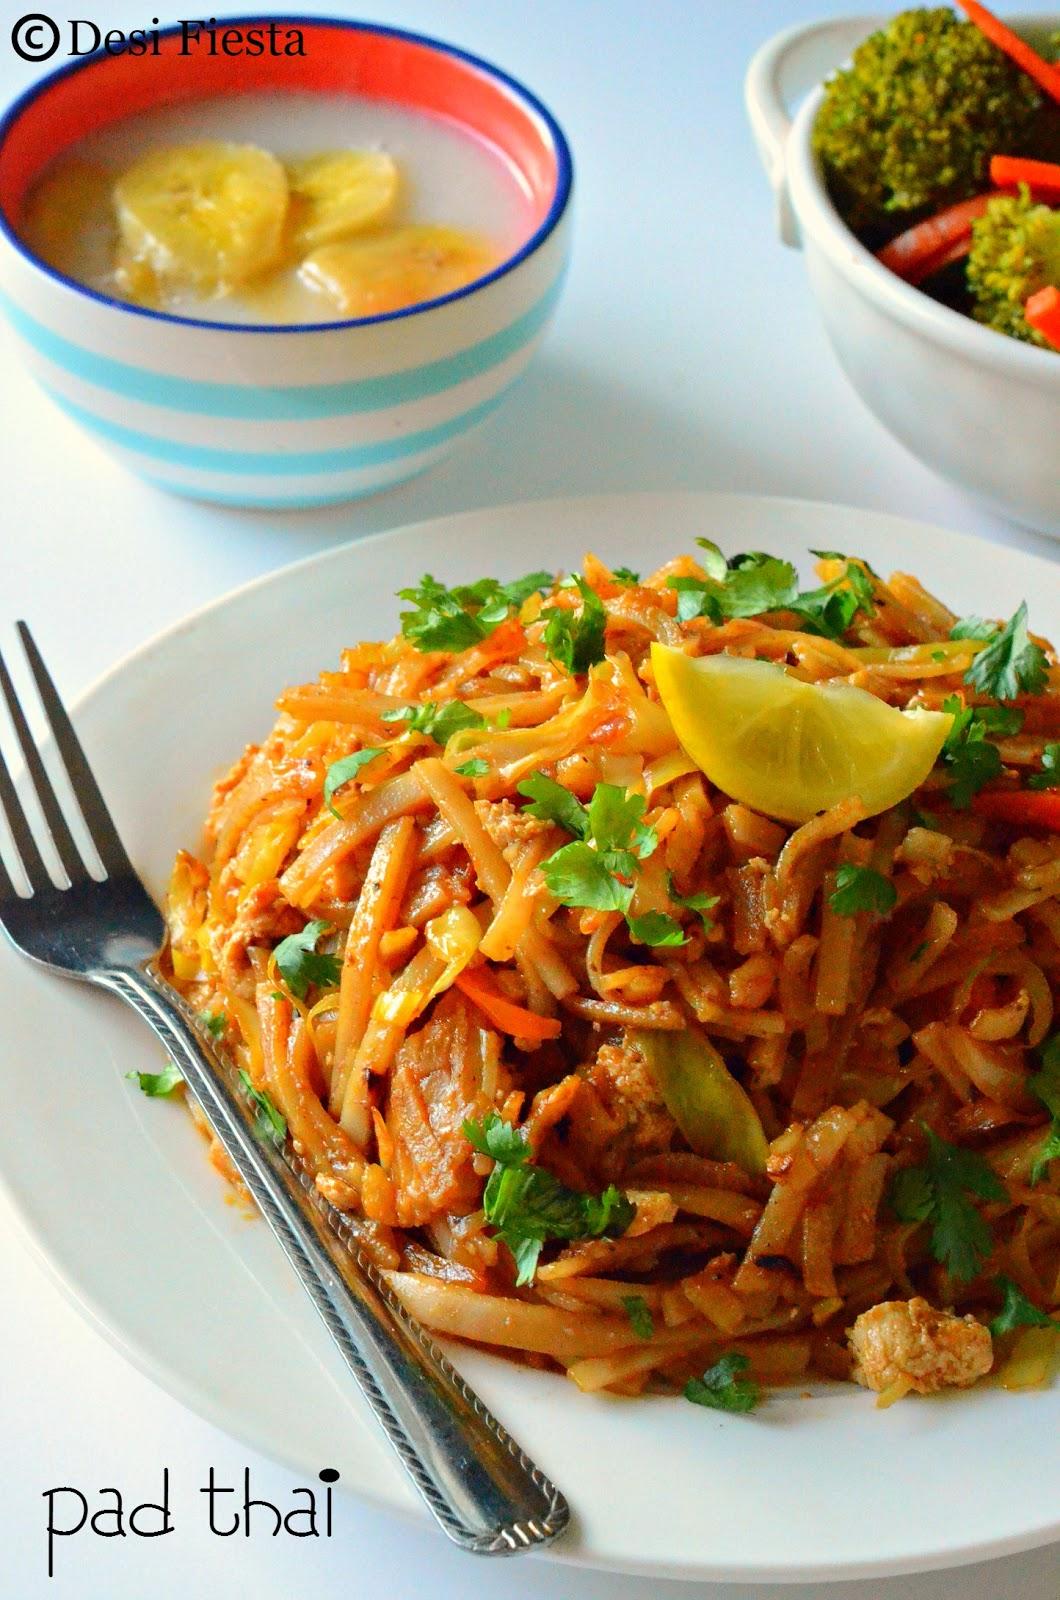 Veg thai noodles